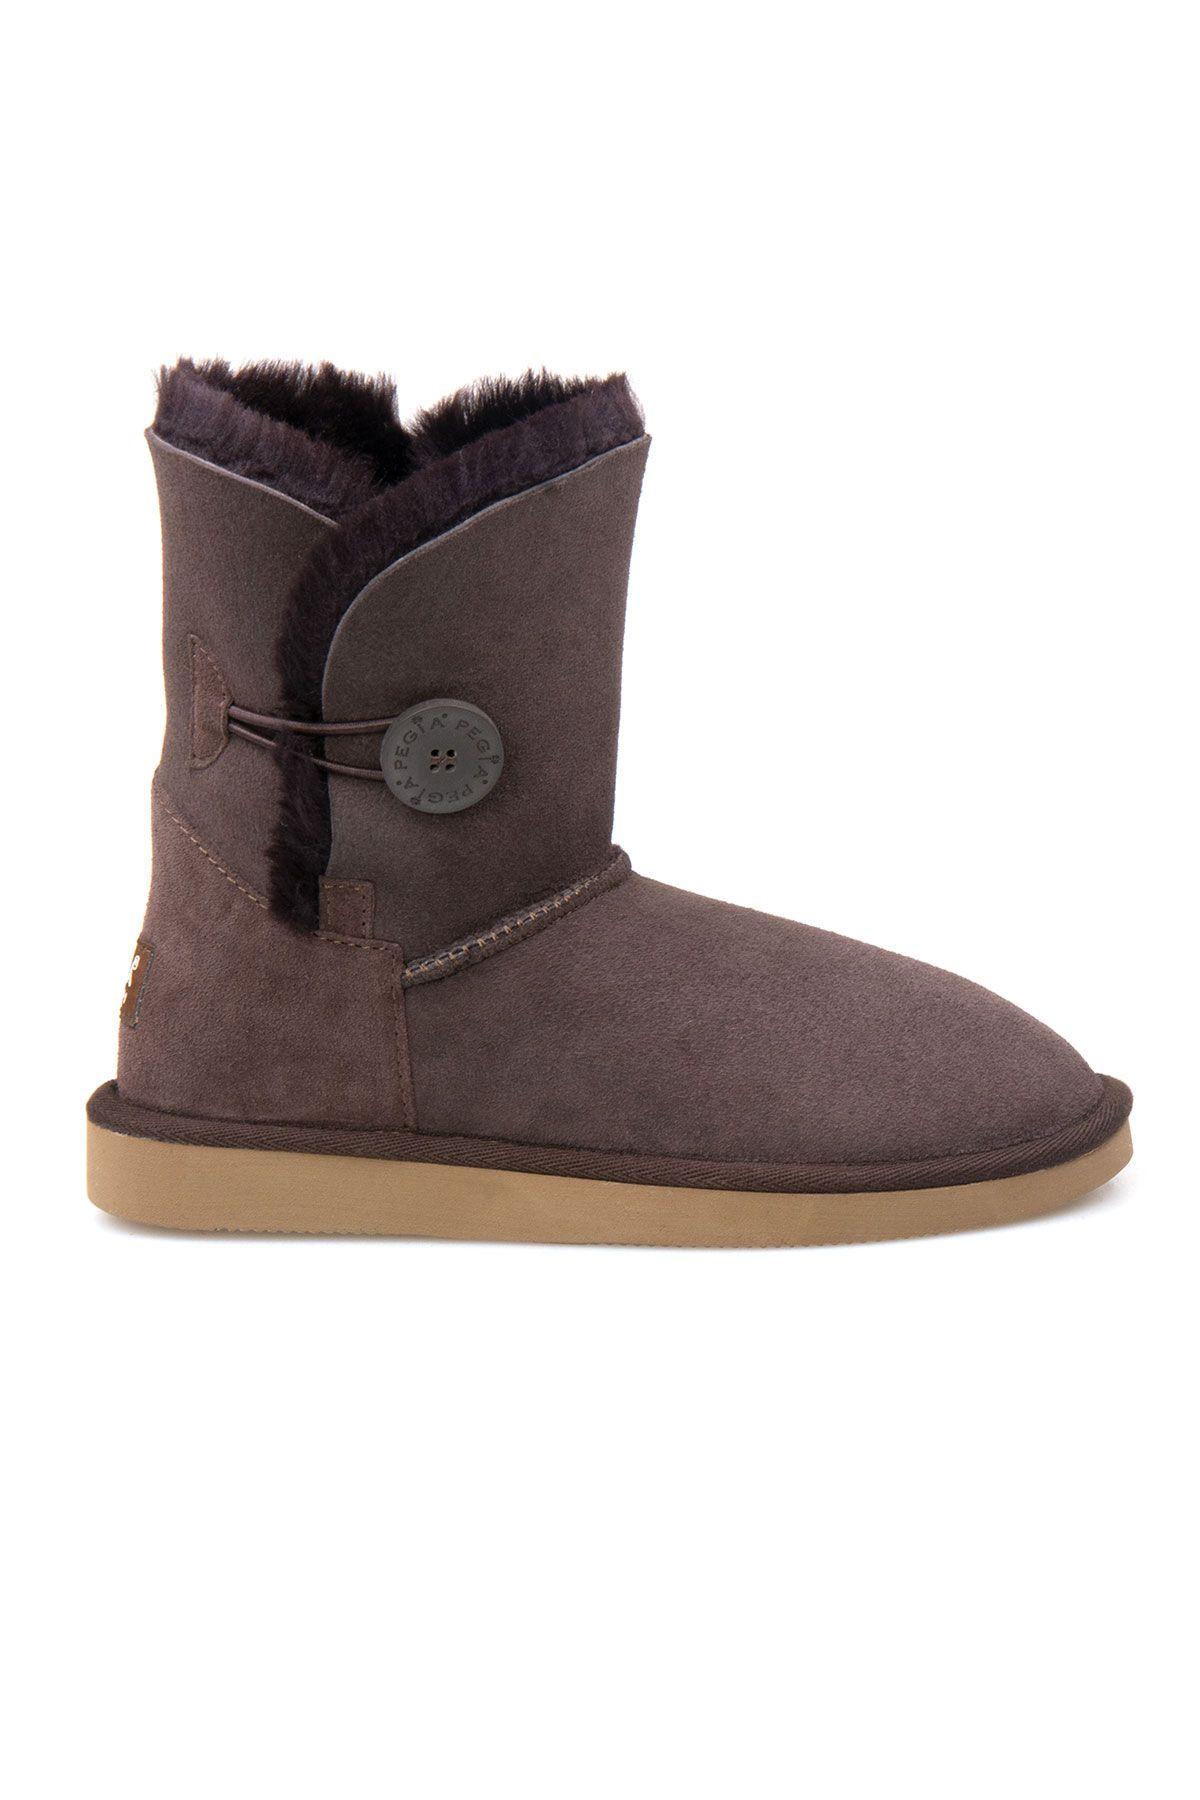 Pegia Genuine Sheepskin Suede Women's Boots with Botton 191031 Brown